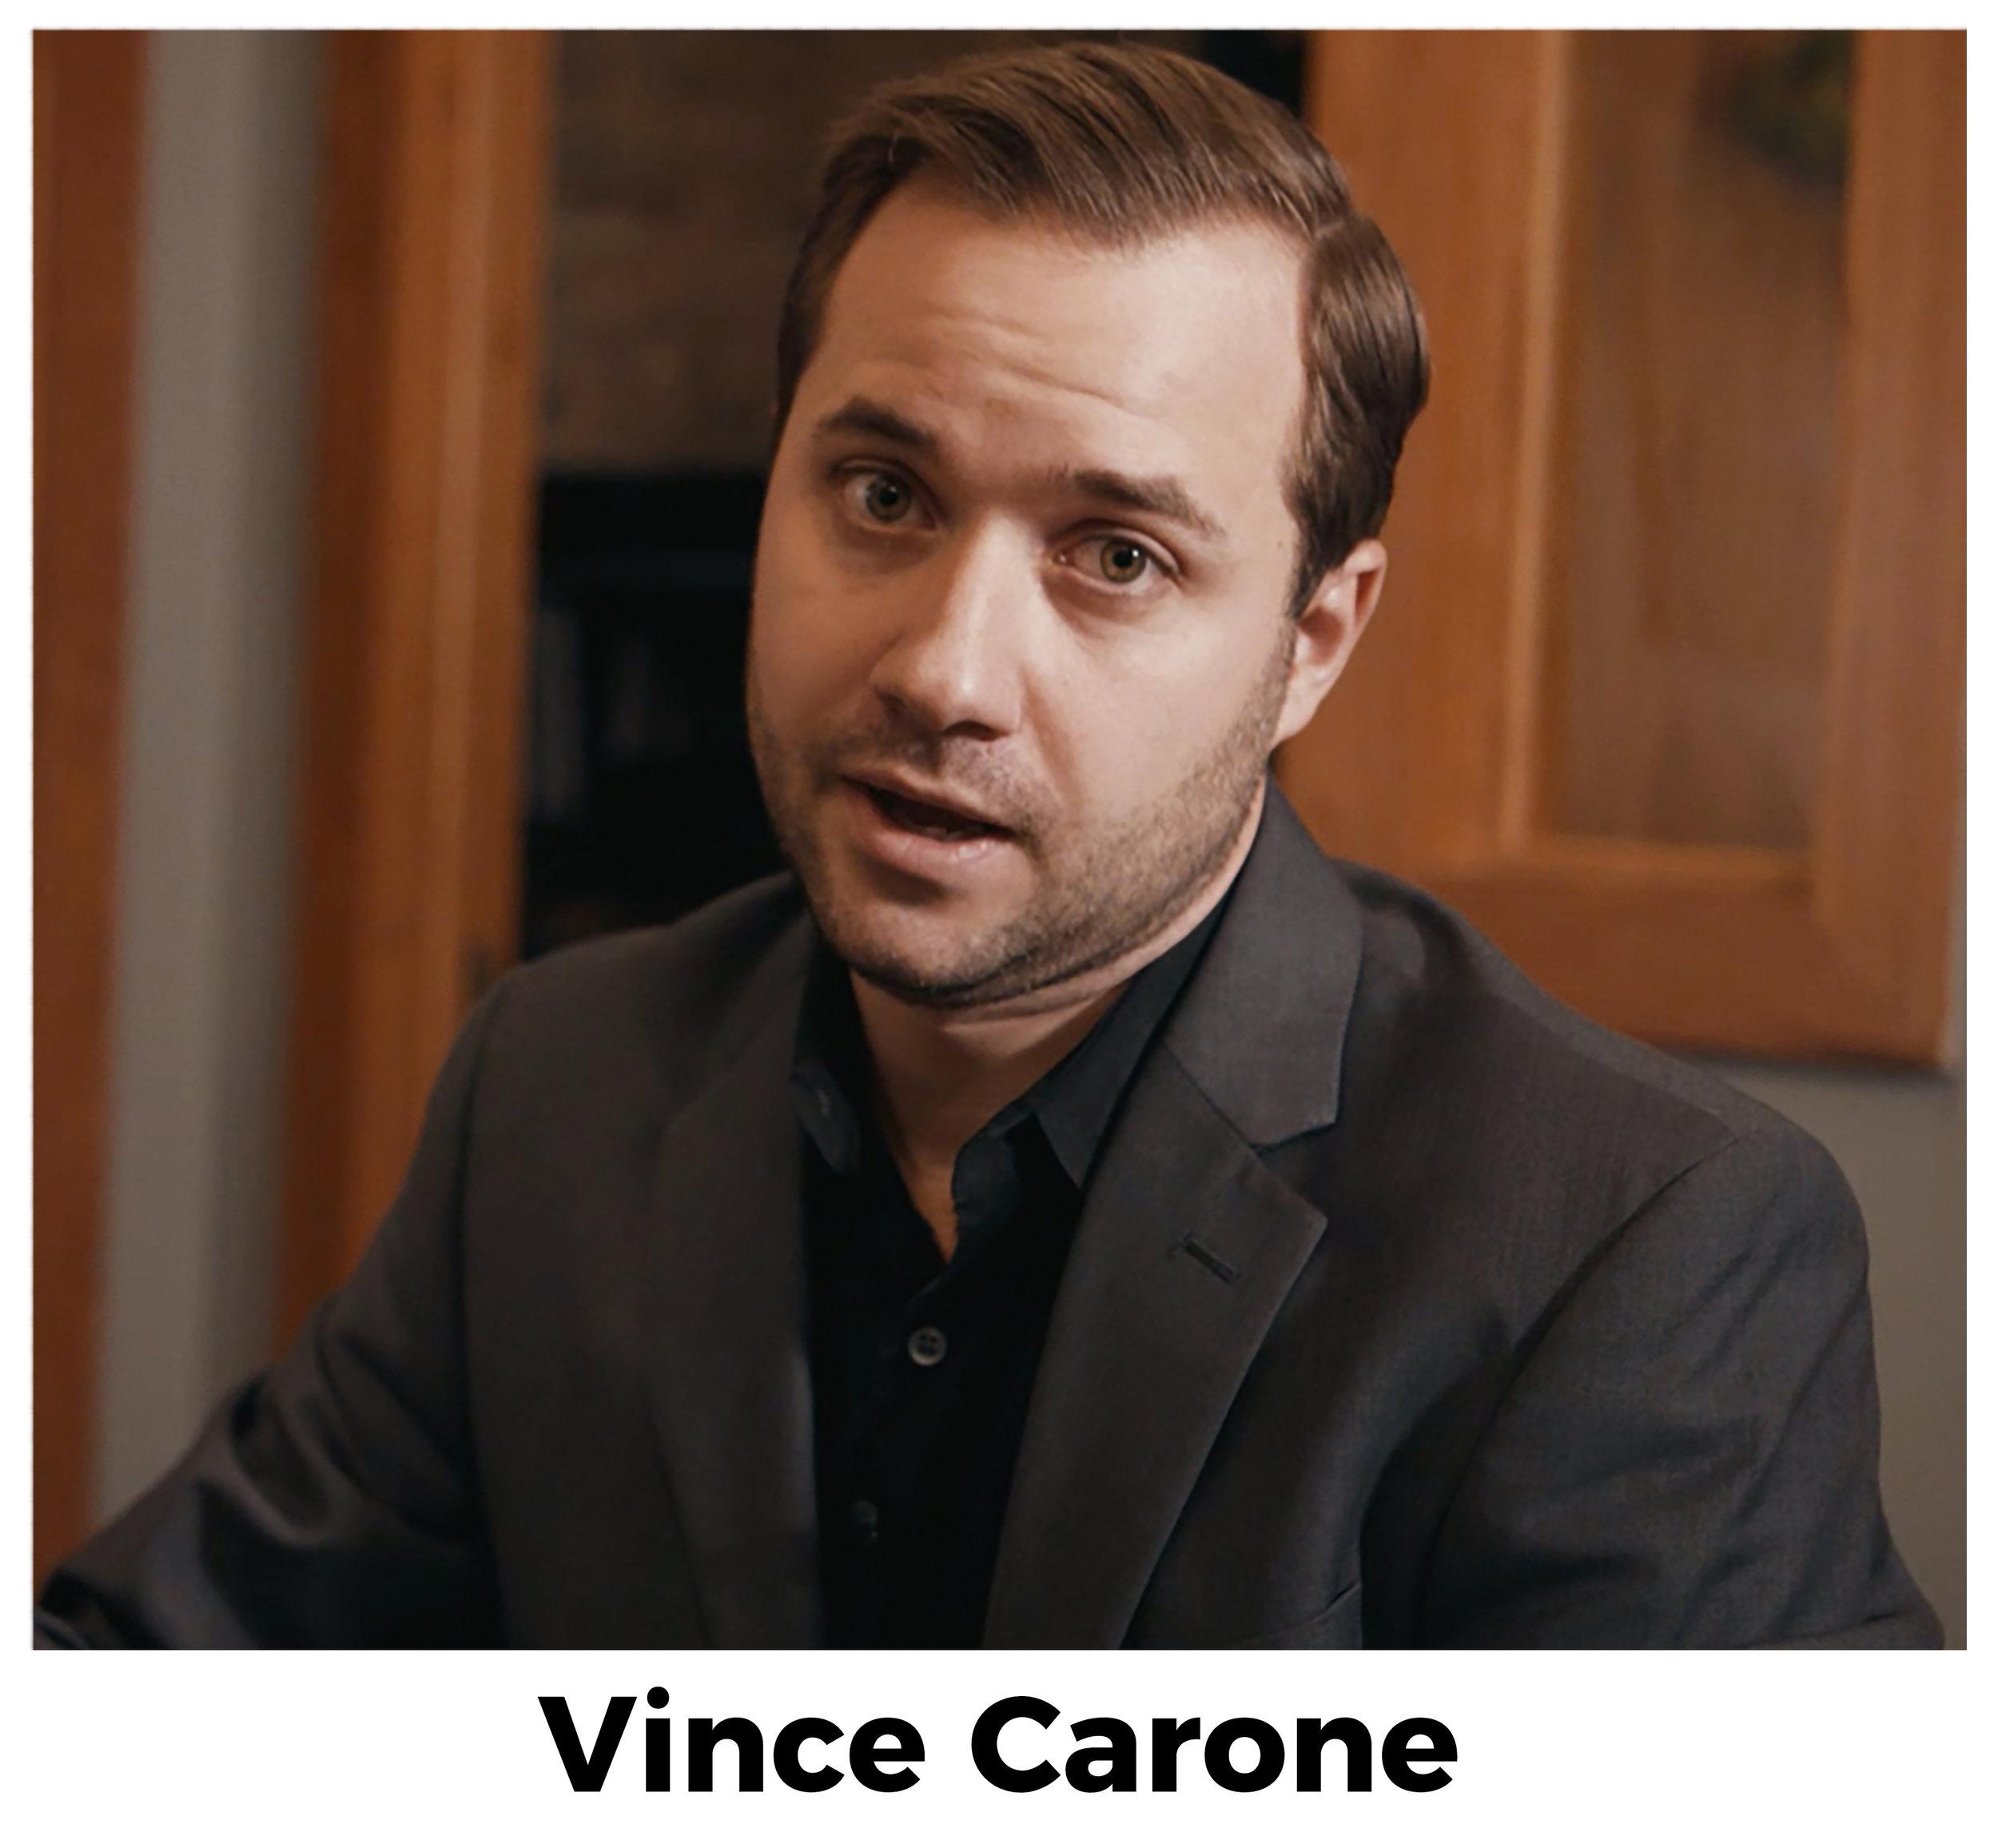 Vince Carone Headshot.jpg